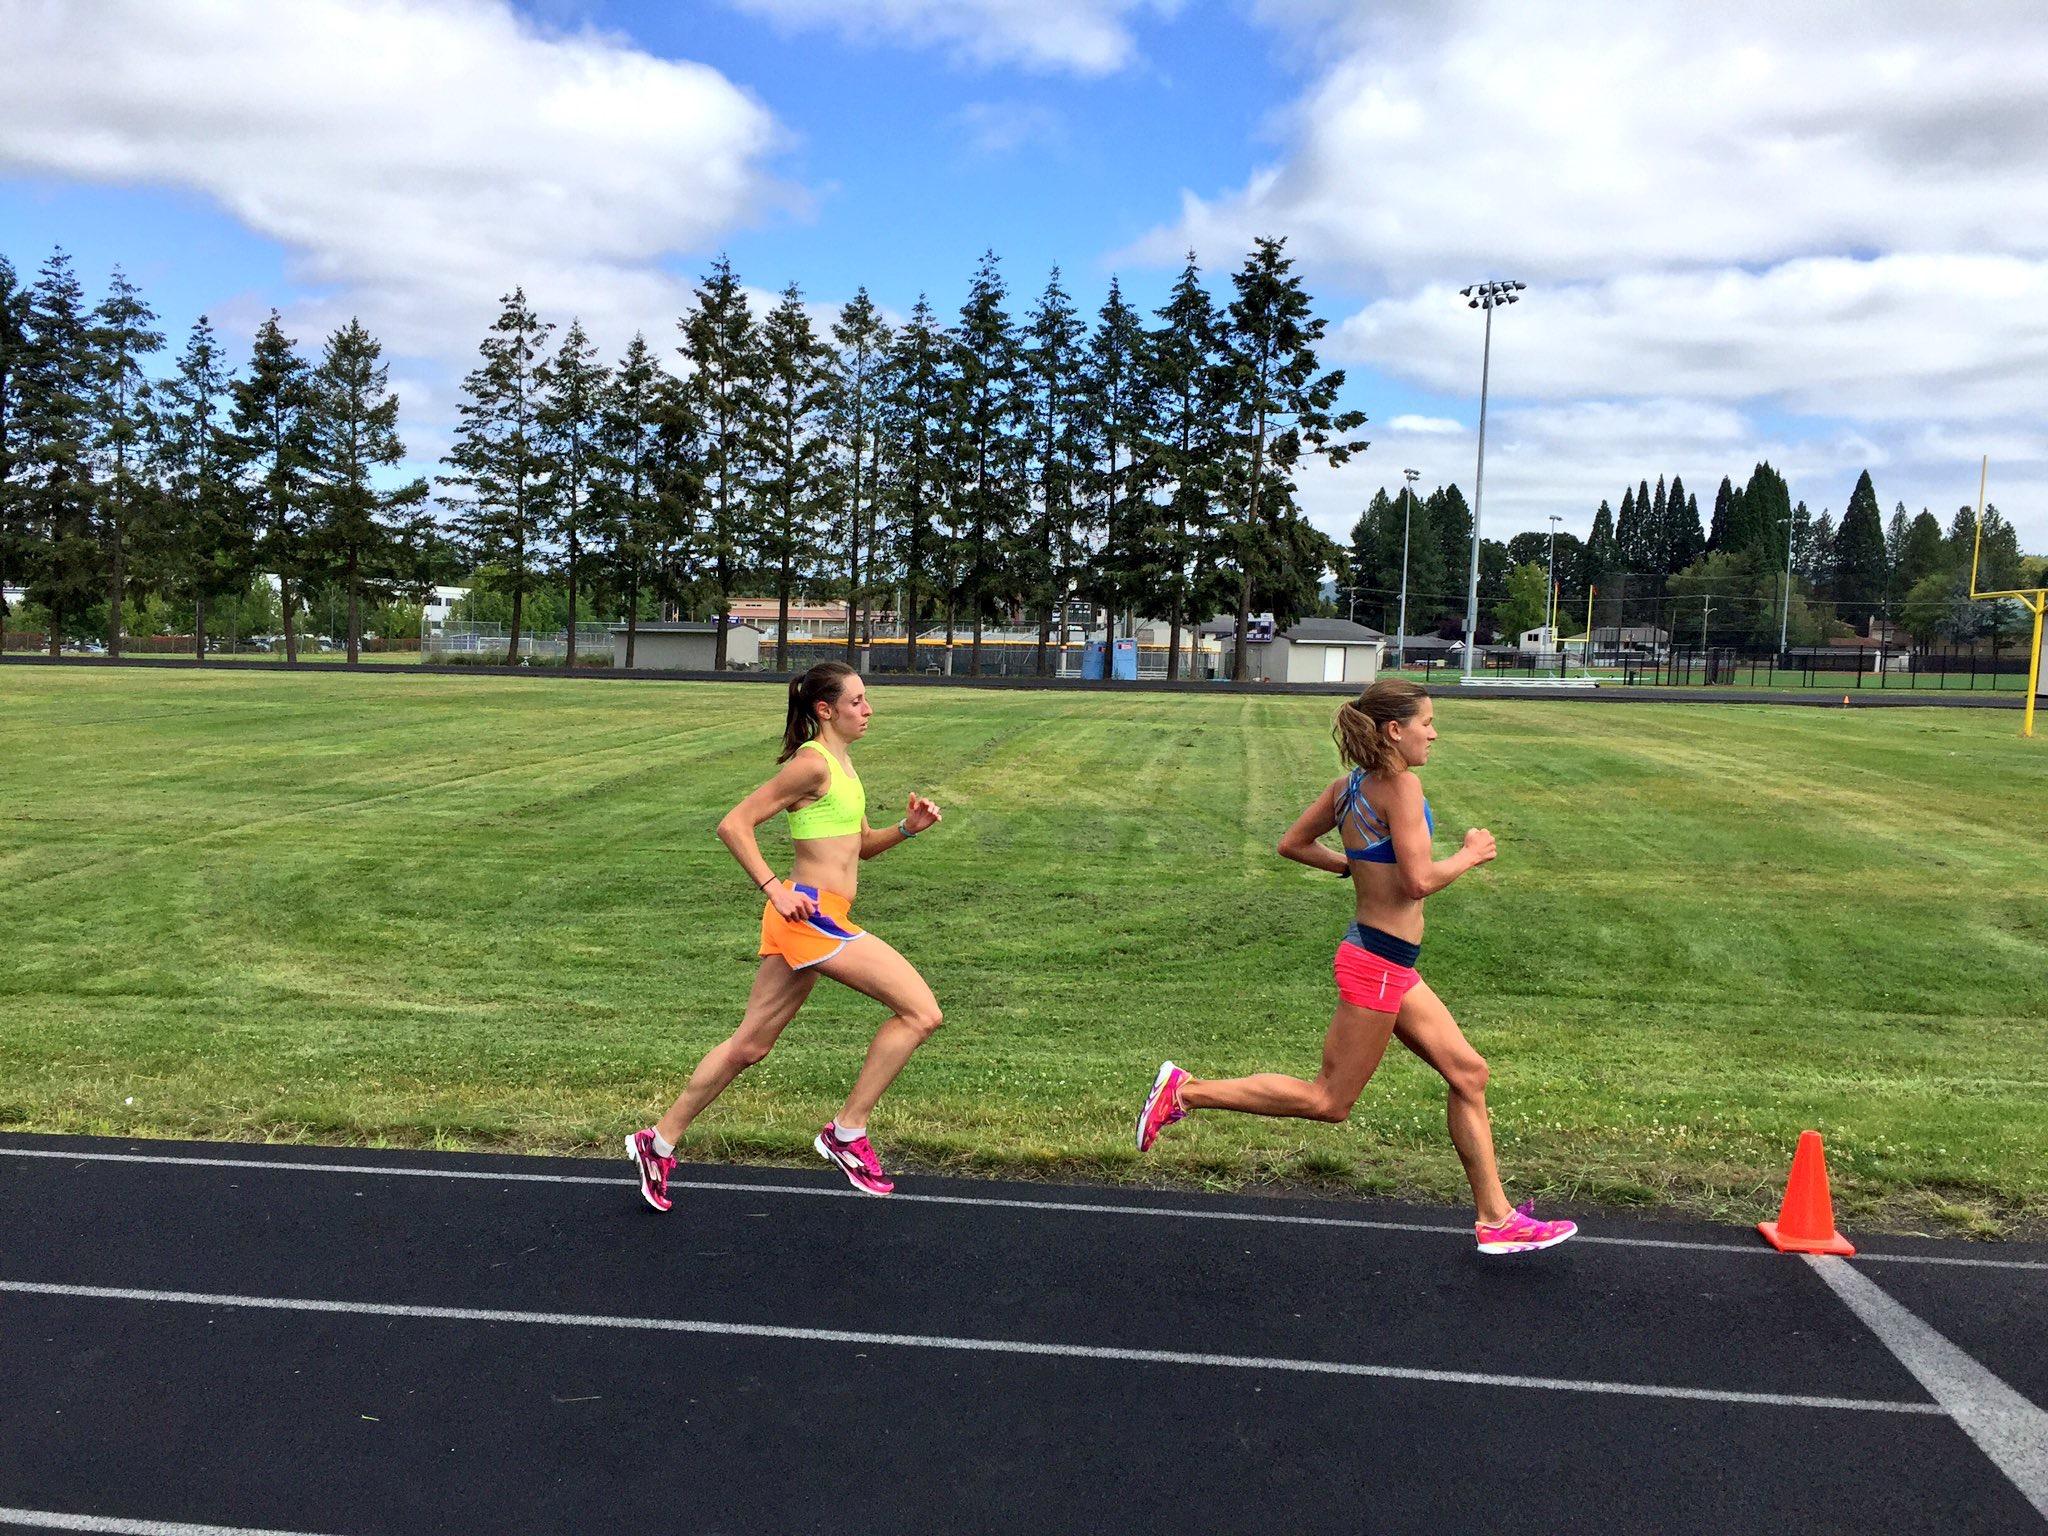 HPW Elite teammates, Kristen Rohde (left) and Tara Welling (right).